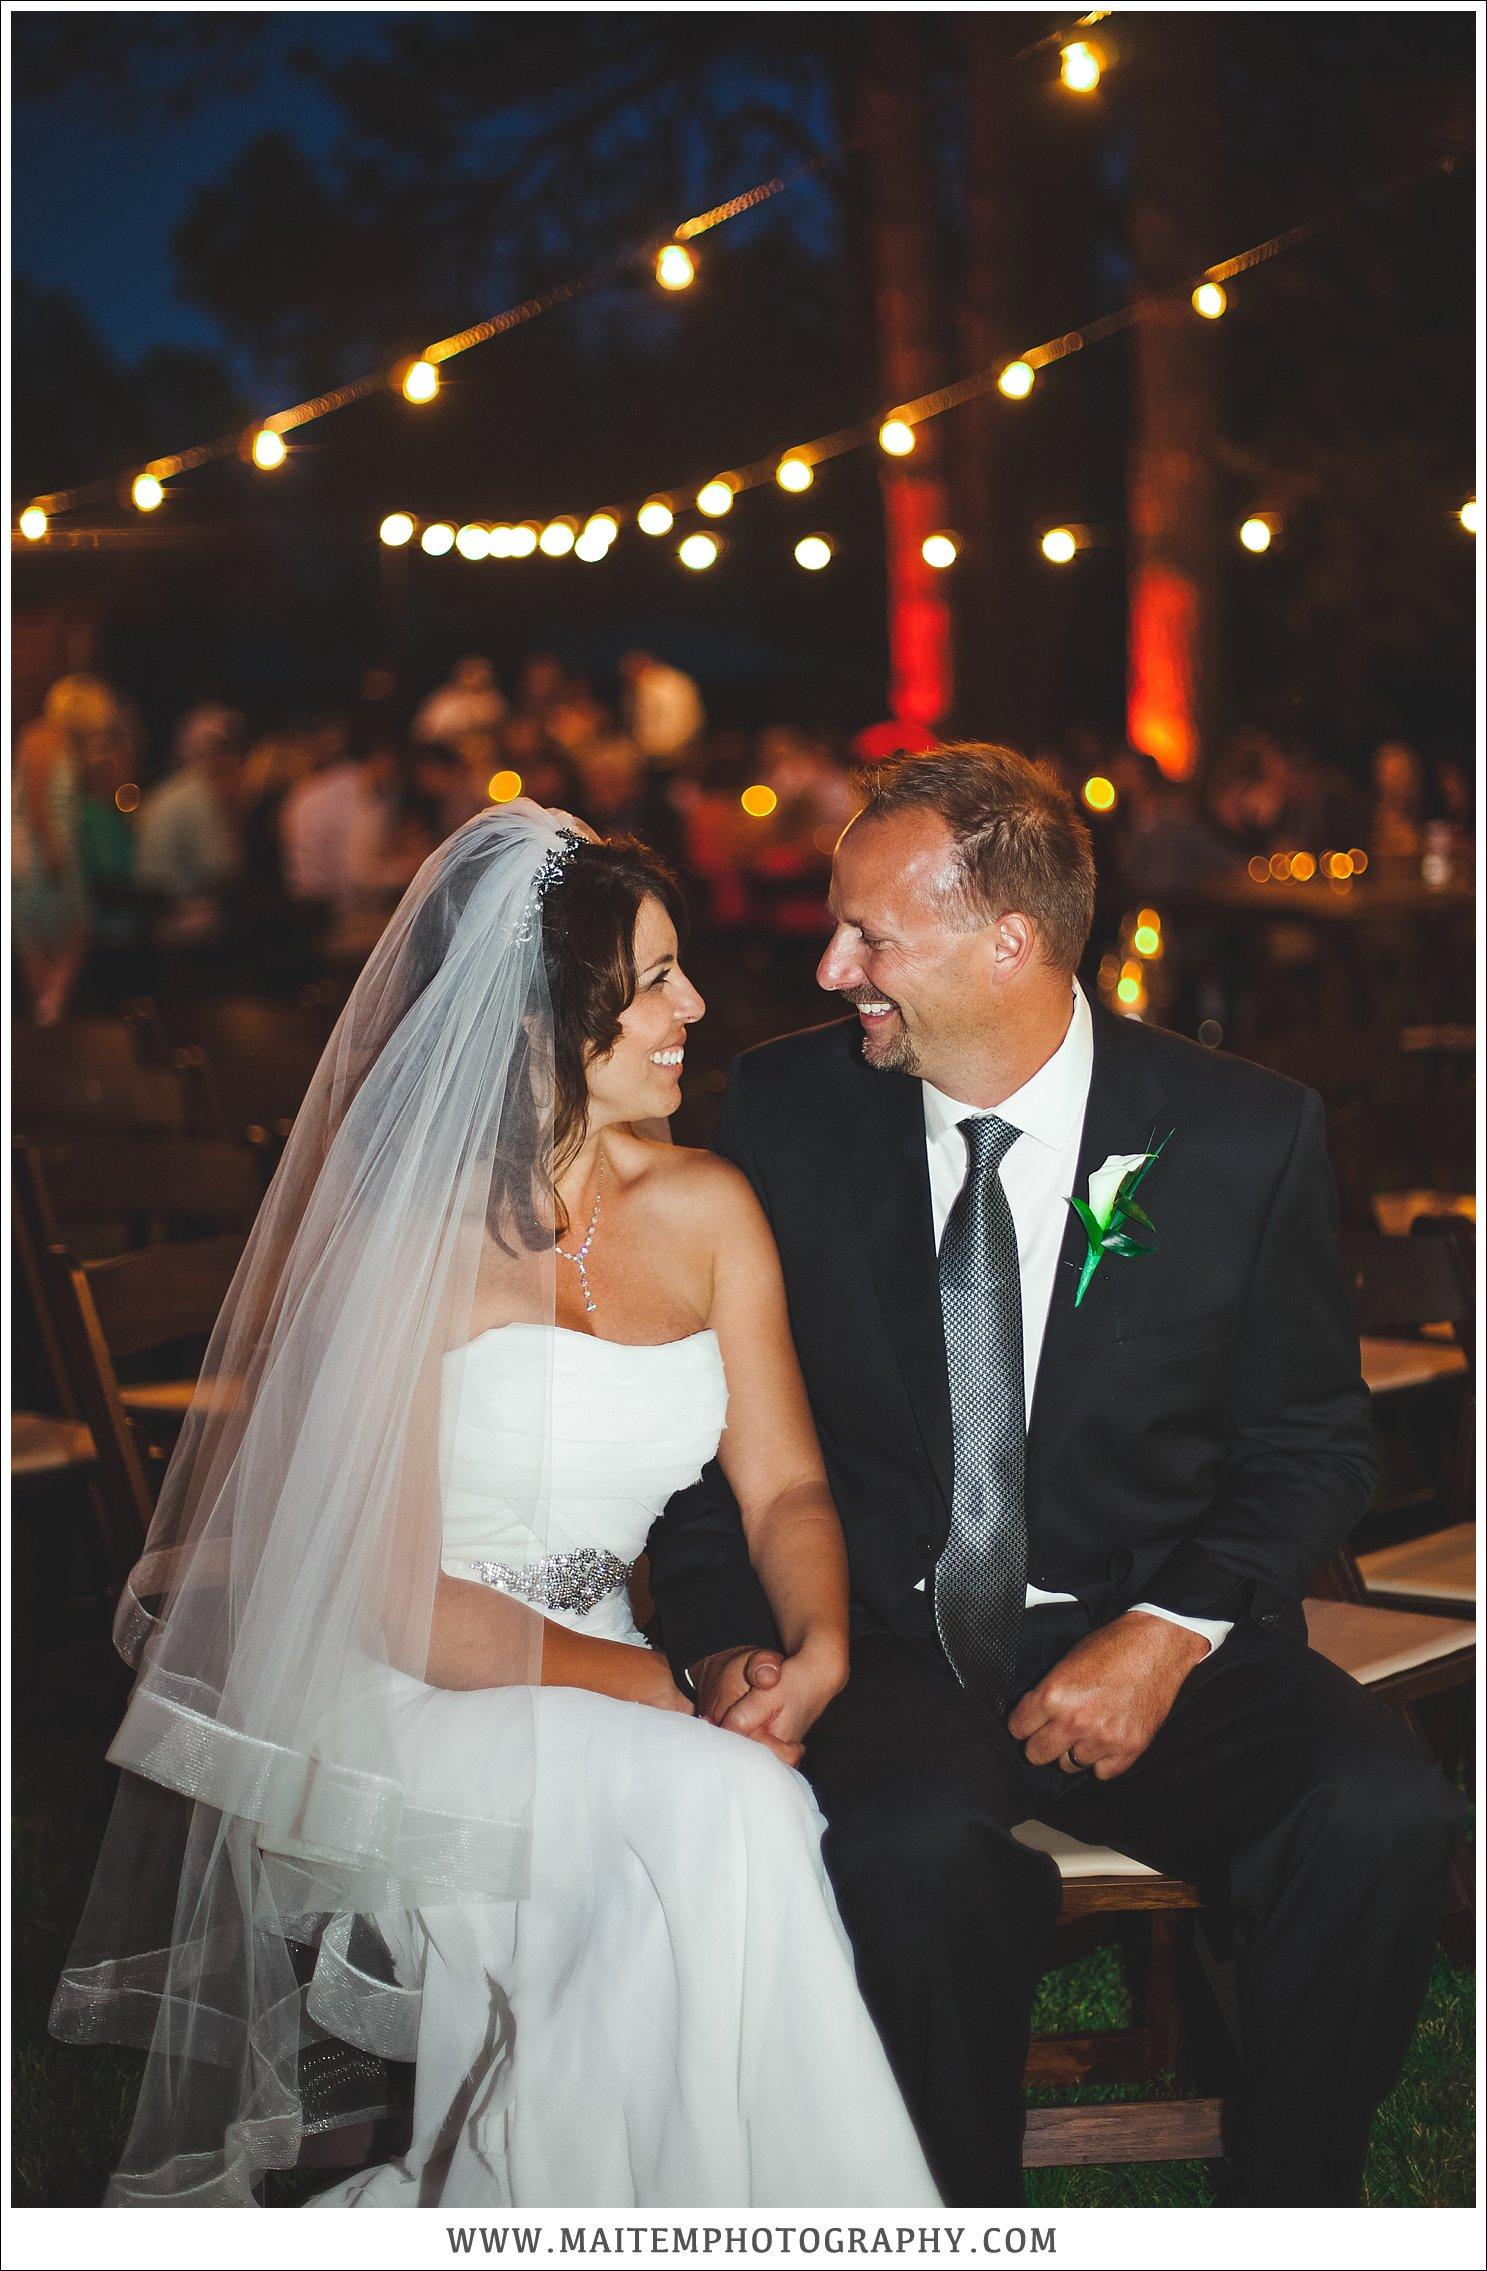 Mr.&Mrs.Kucewesky (105 of 114).jpg